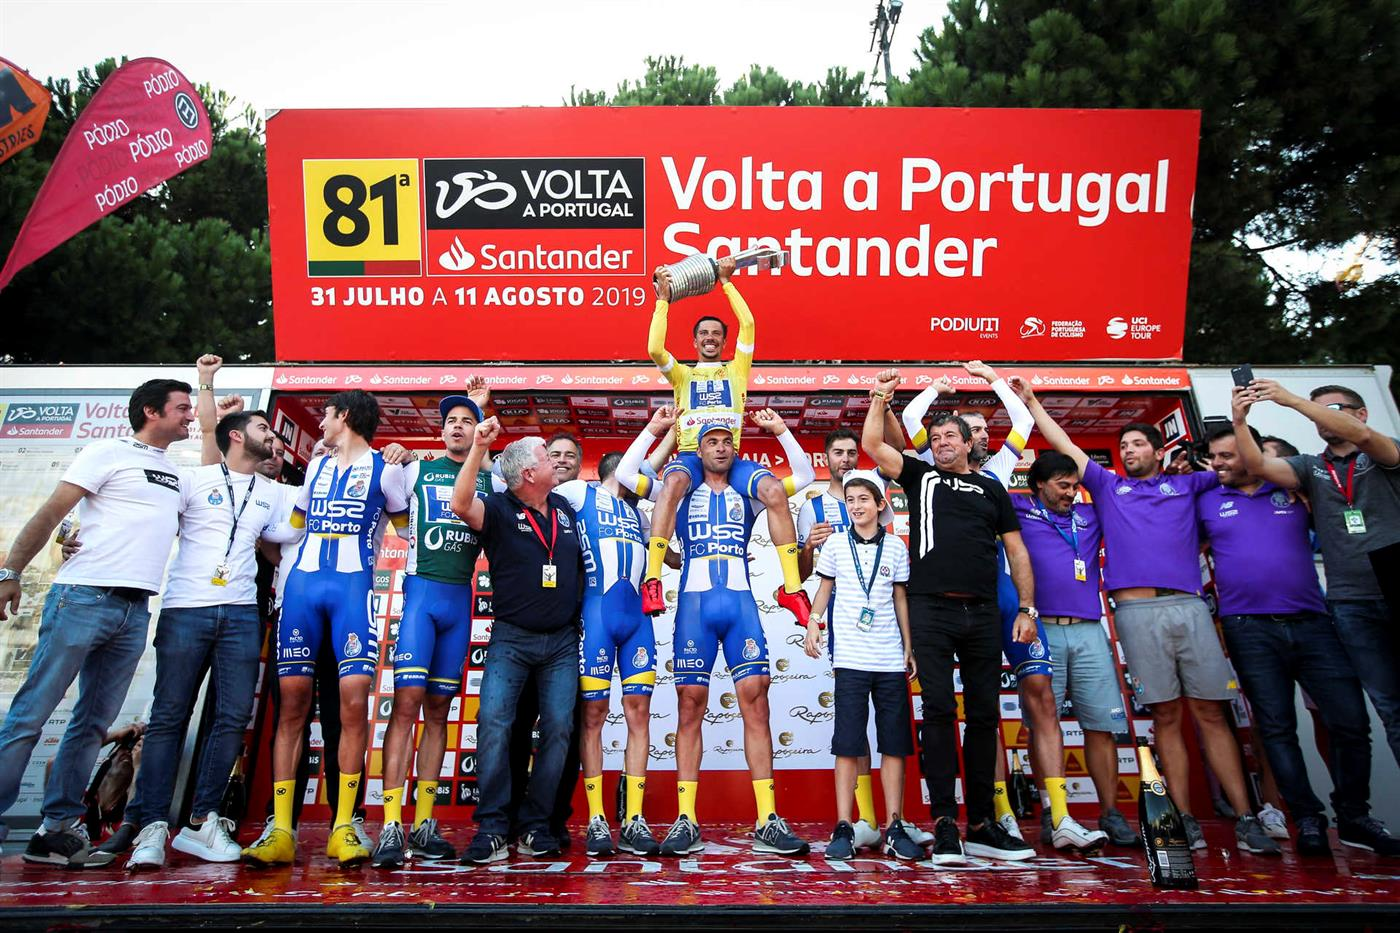 82ª Volta a Portugal adiada para 2021!